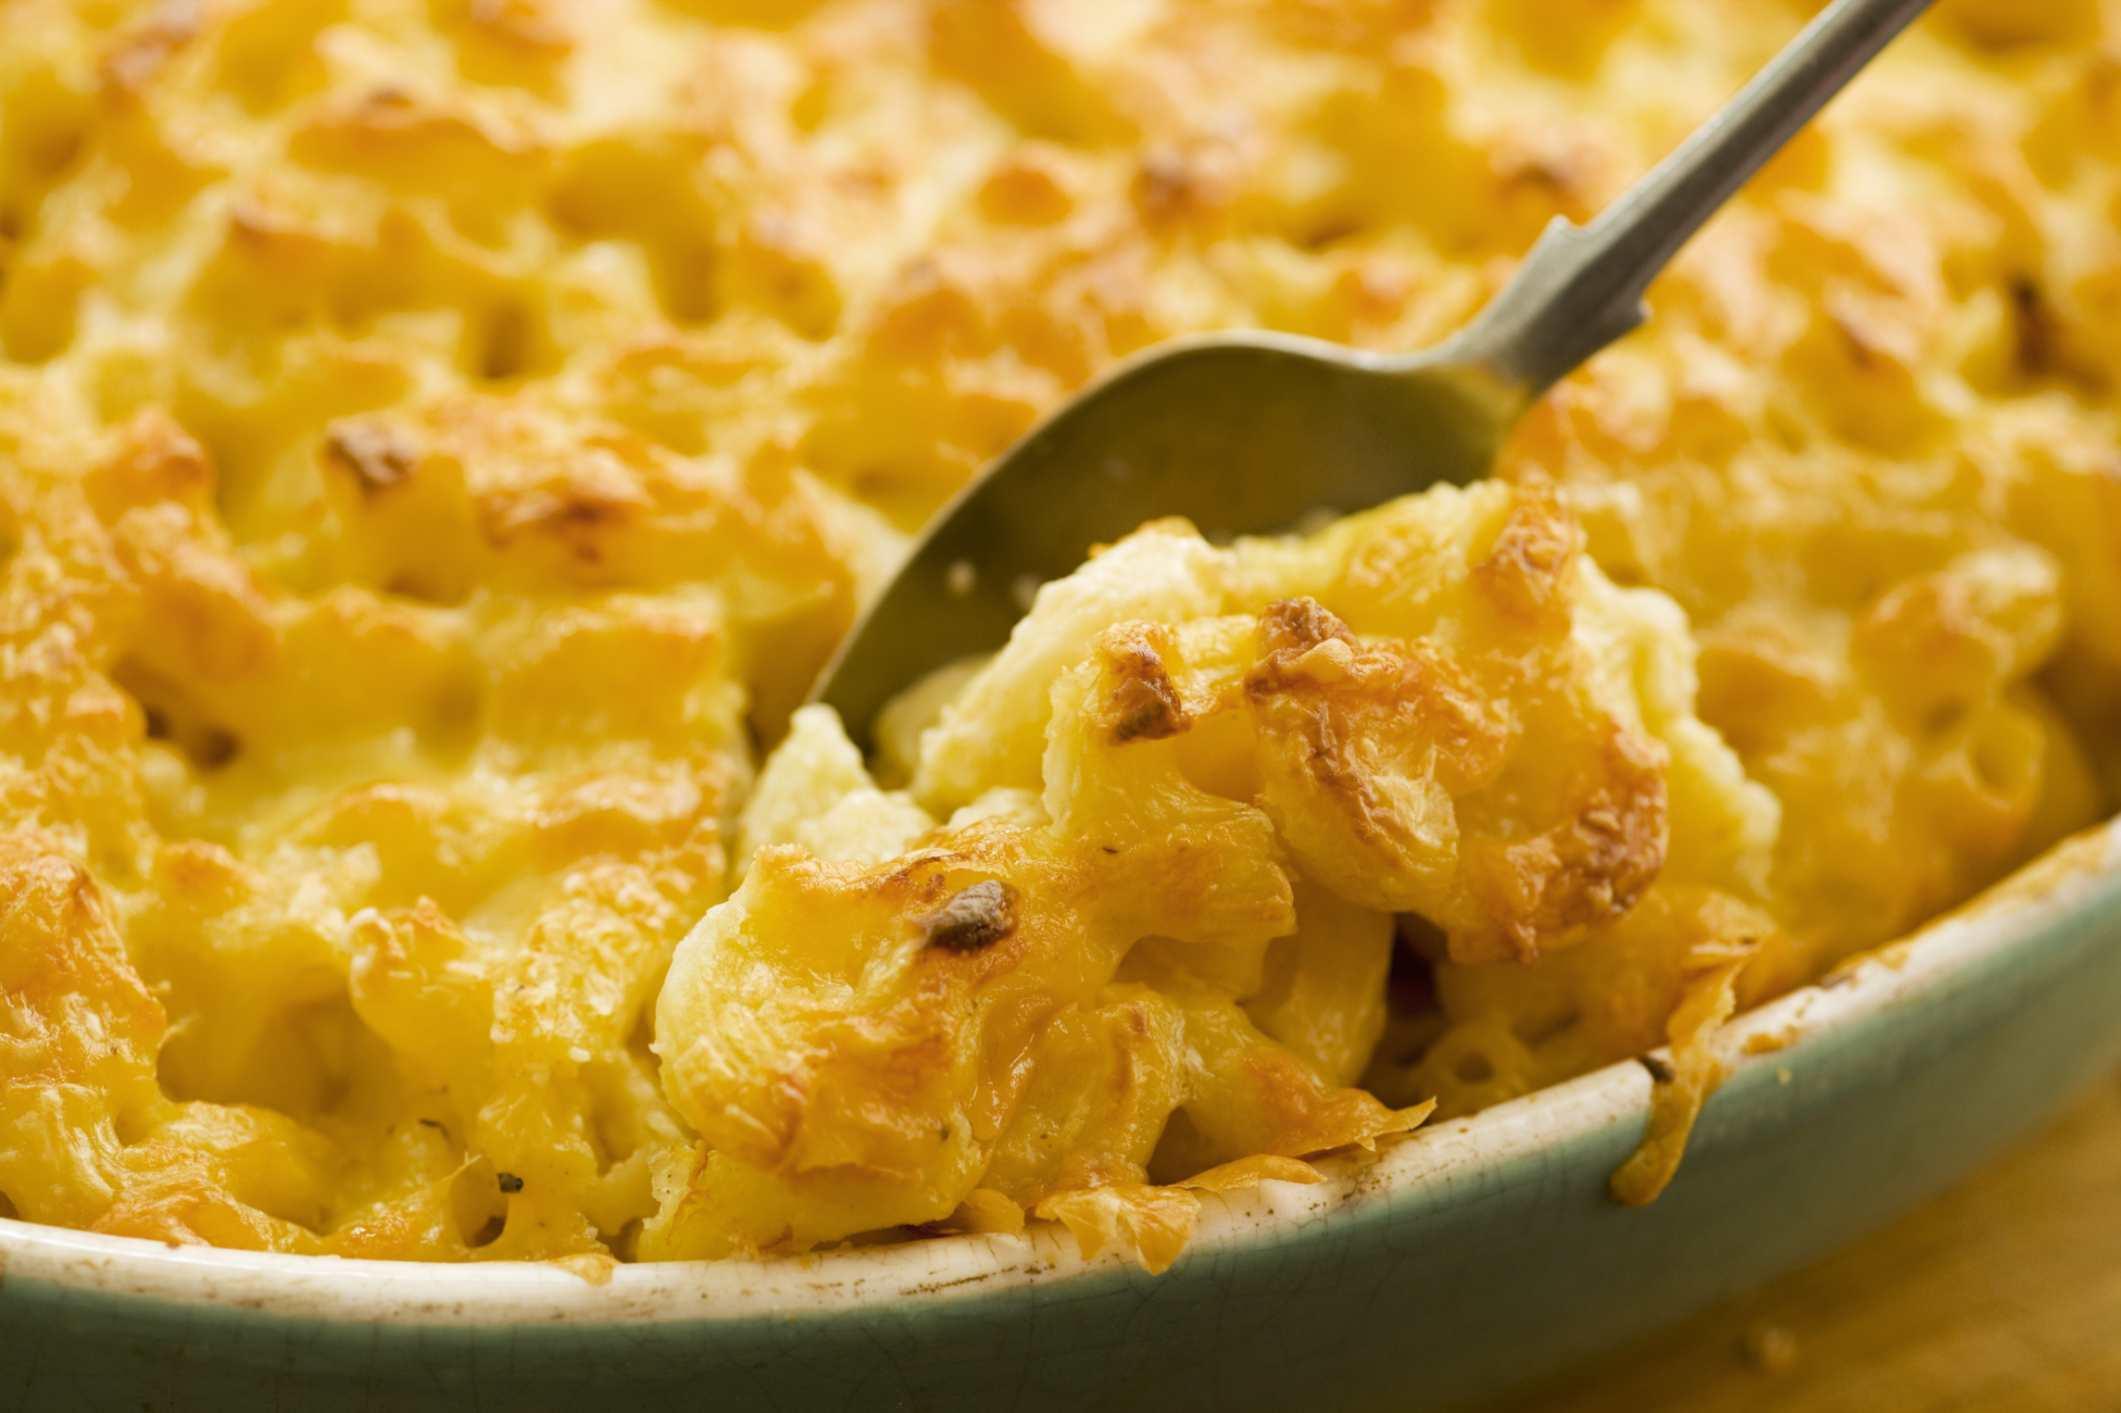 Gluten-Free Macaroni and Cheese